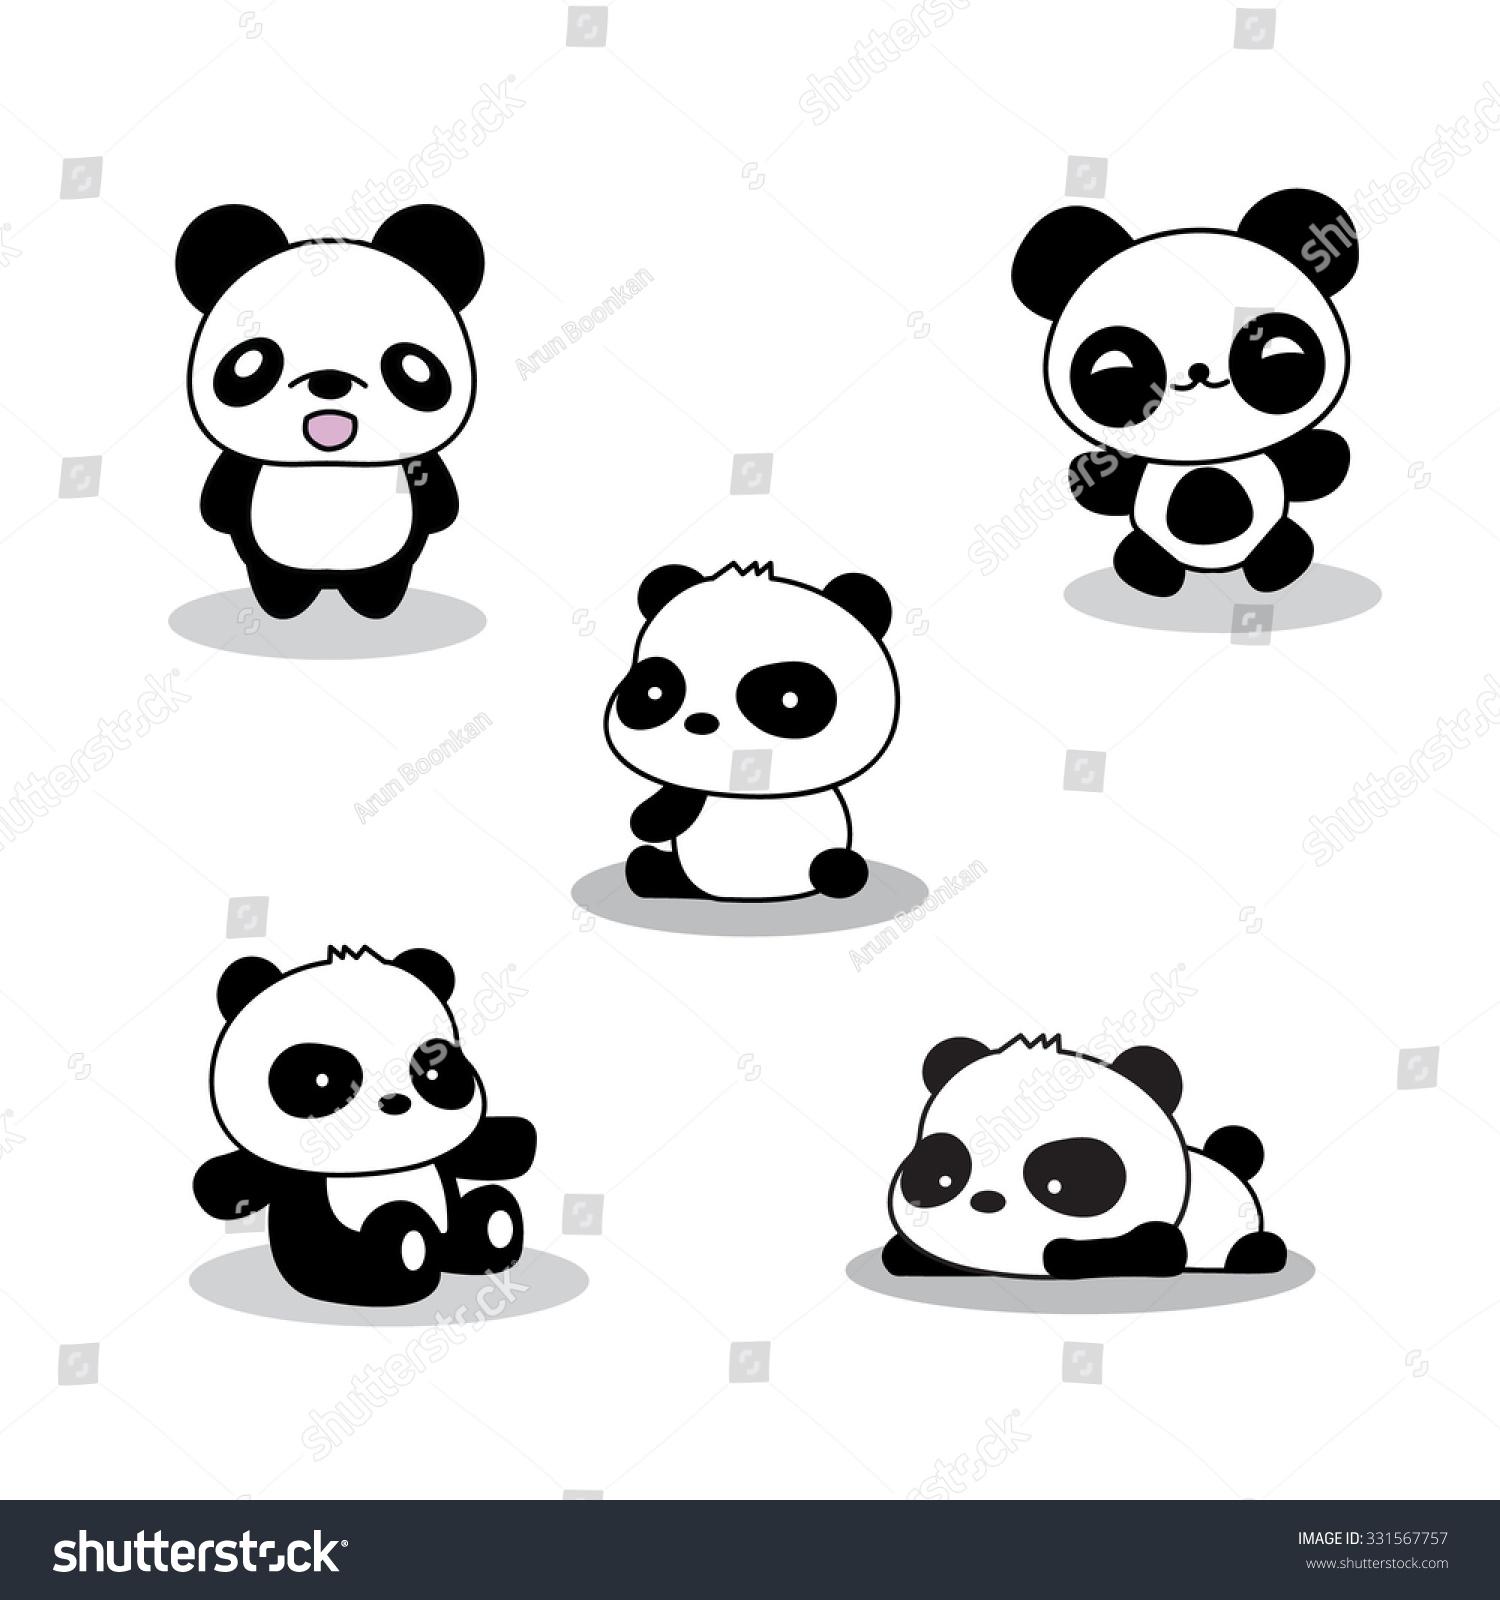 Cute Sleeping Babies Wallpapers Pics For Gt Panda Bear Cartoon Sitting